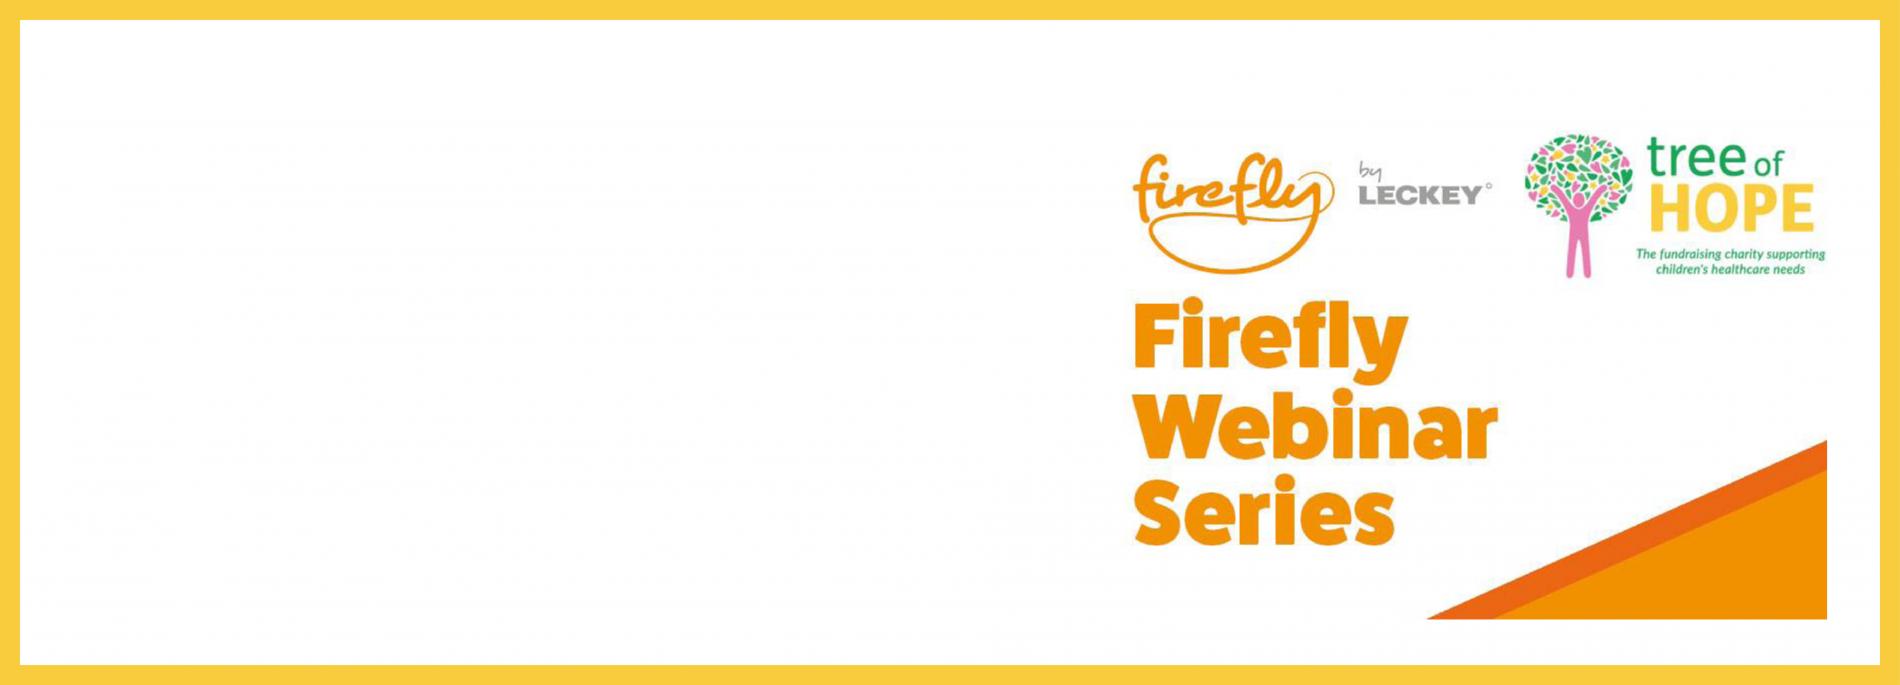 FIrefly Webinar. Web Banner